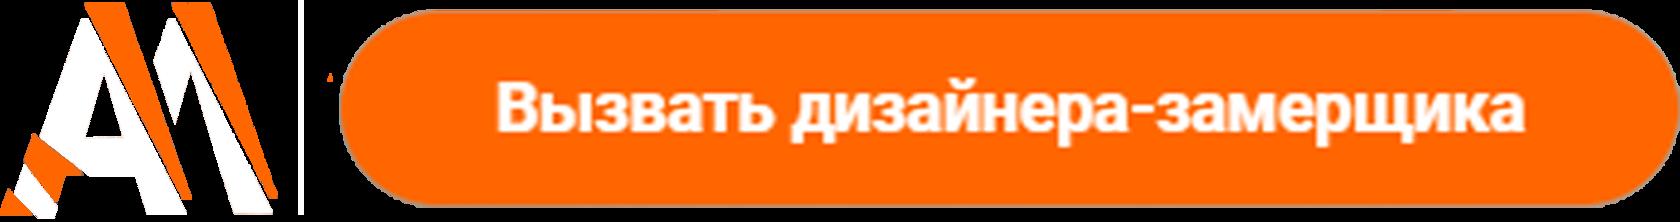 Арт Мебель Кухни на заказ в Краснодаре с 2008г